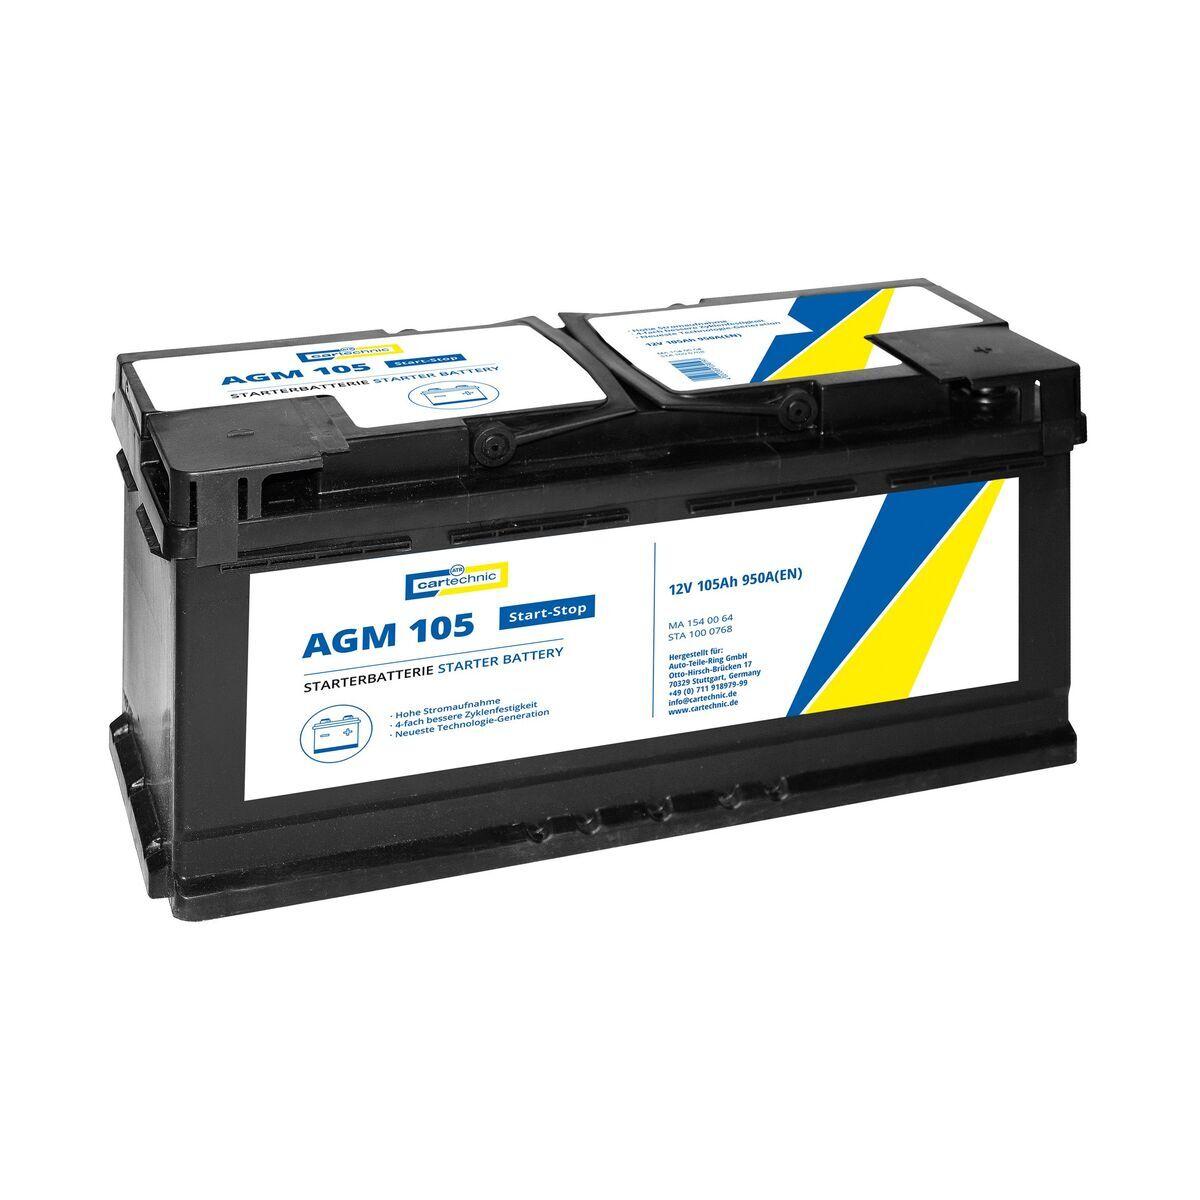 Autobaterie AGM 105 Ah 12V, pro start-stop systém, 392x175x190 mm - Cartechnic